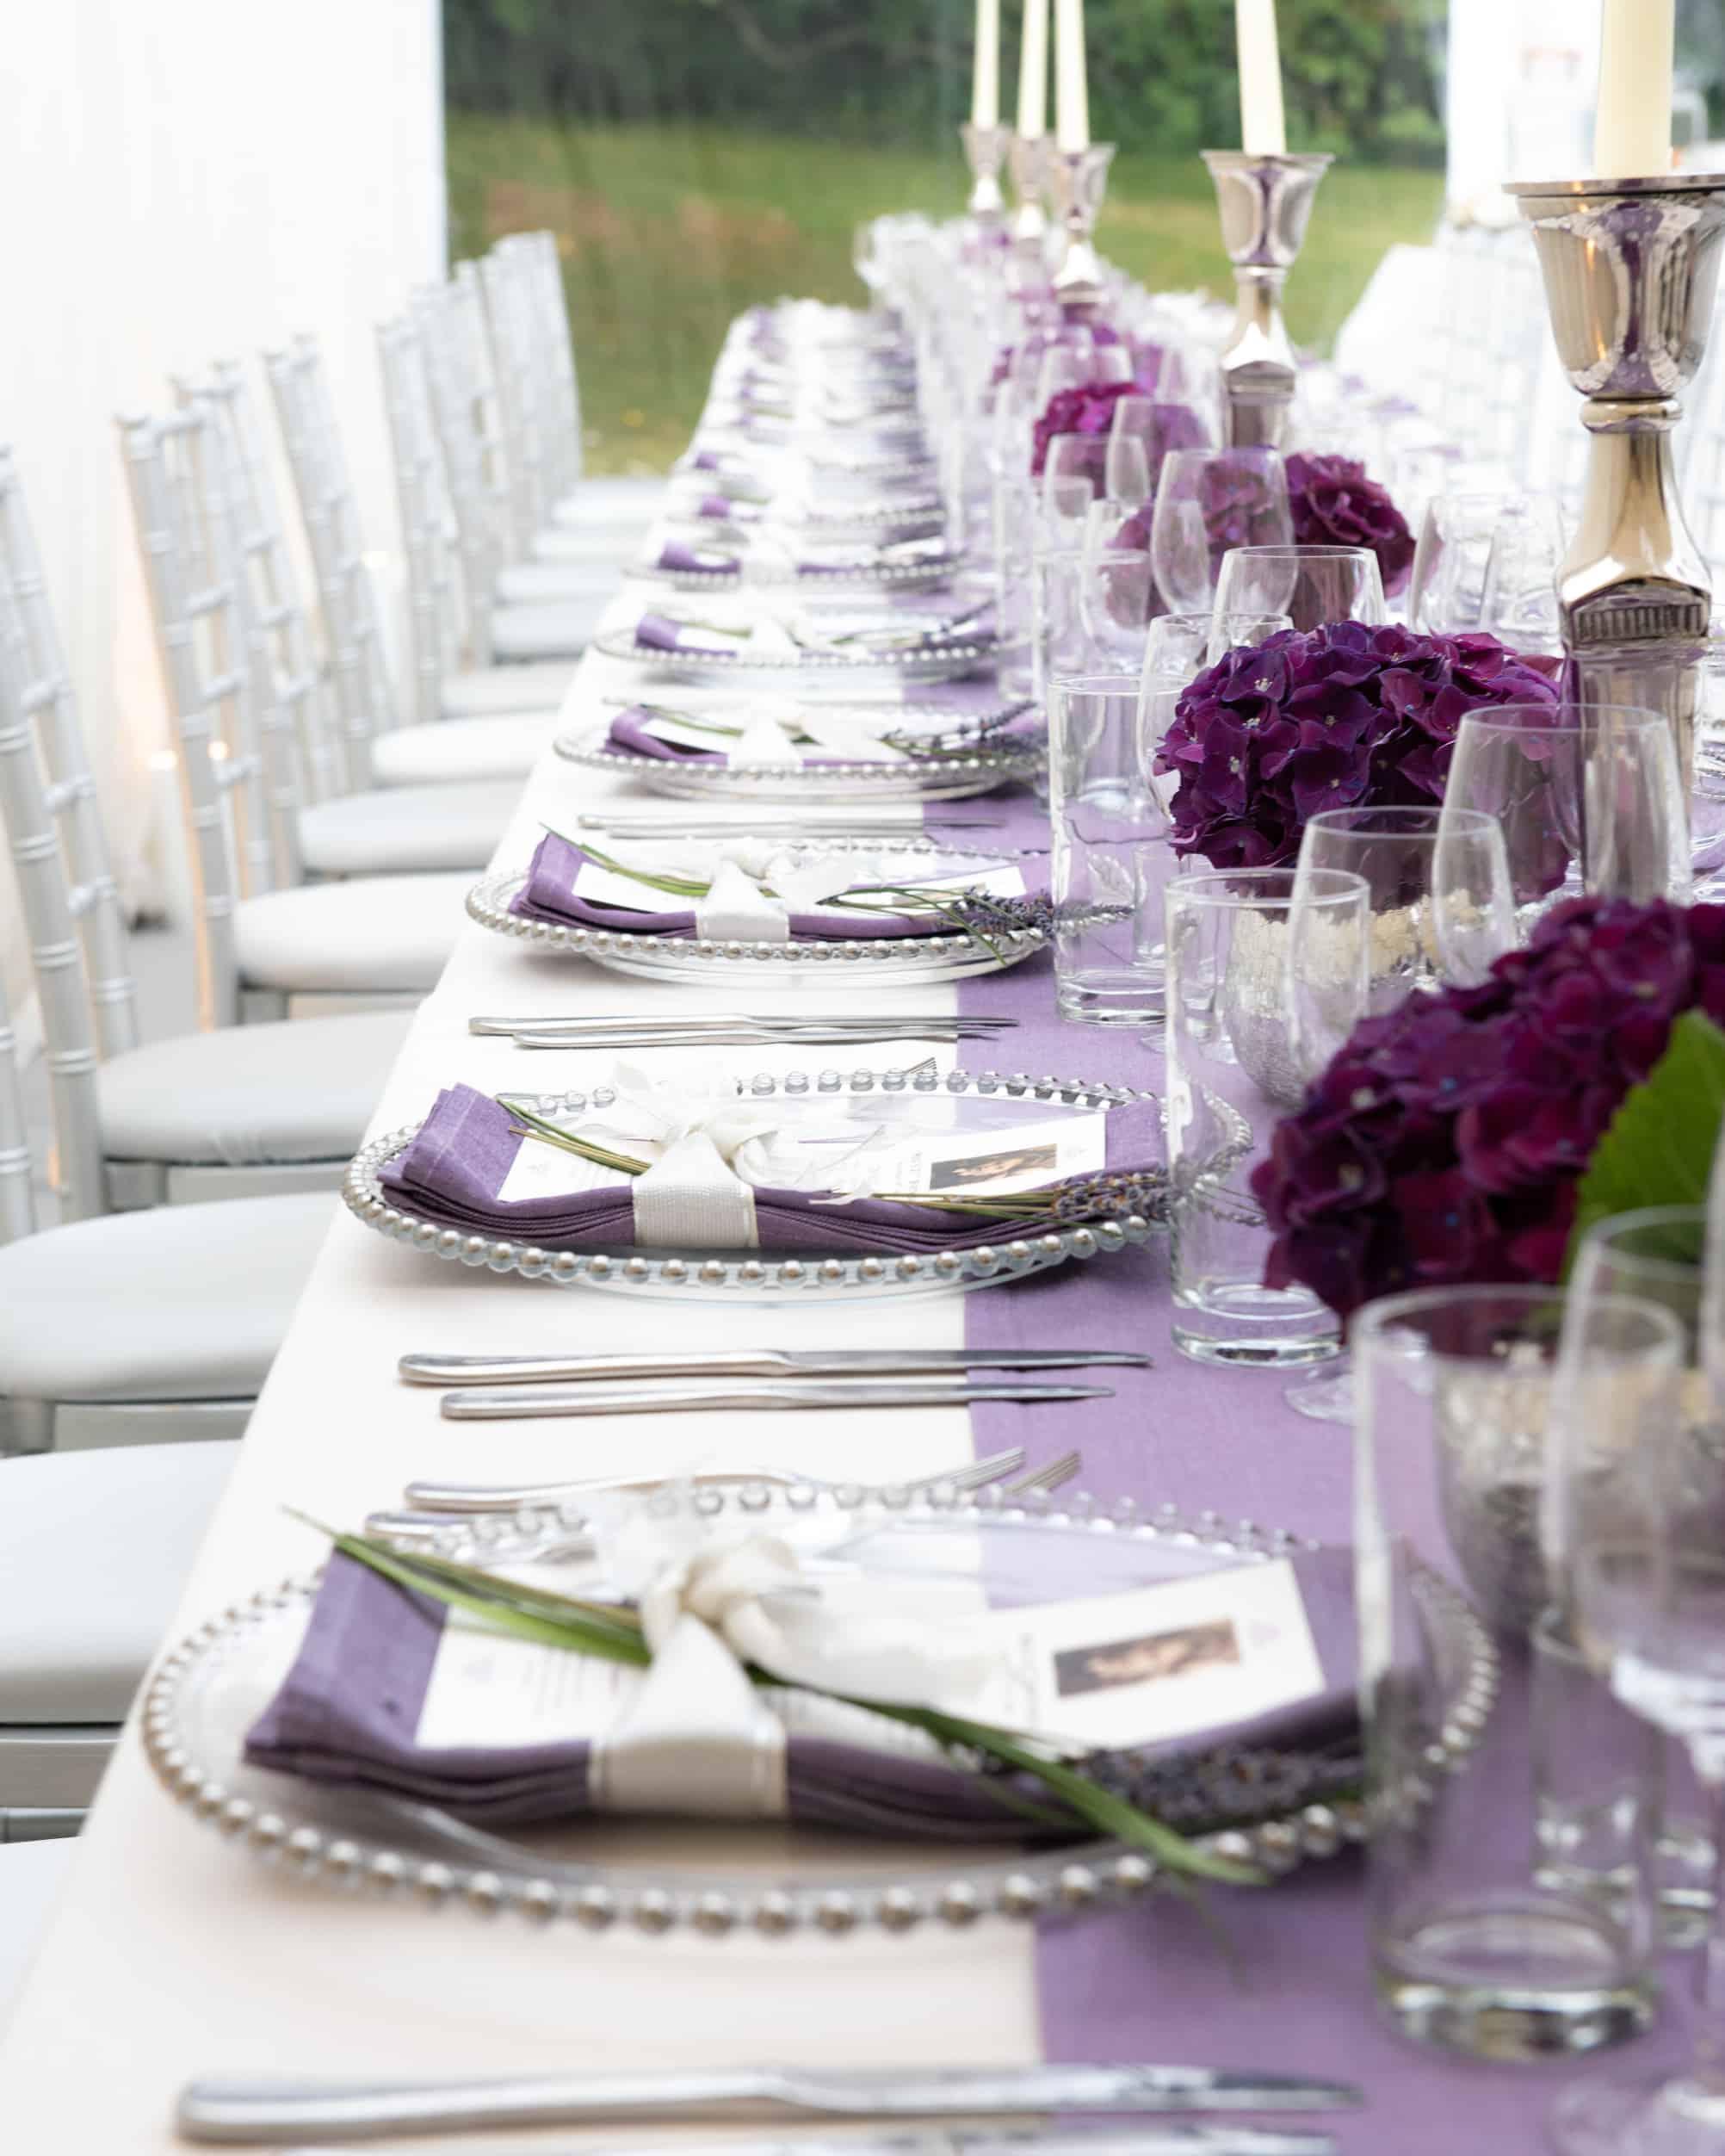 Purple napkins on charter plates